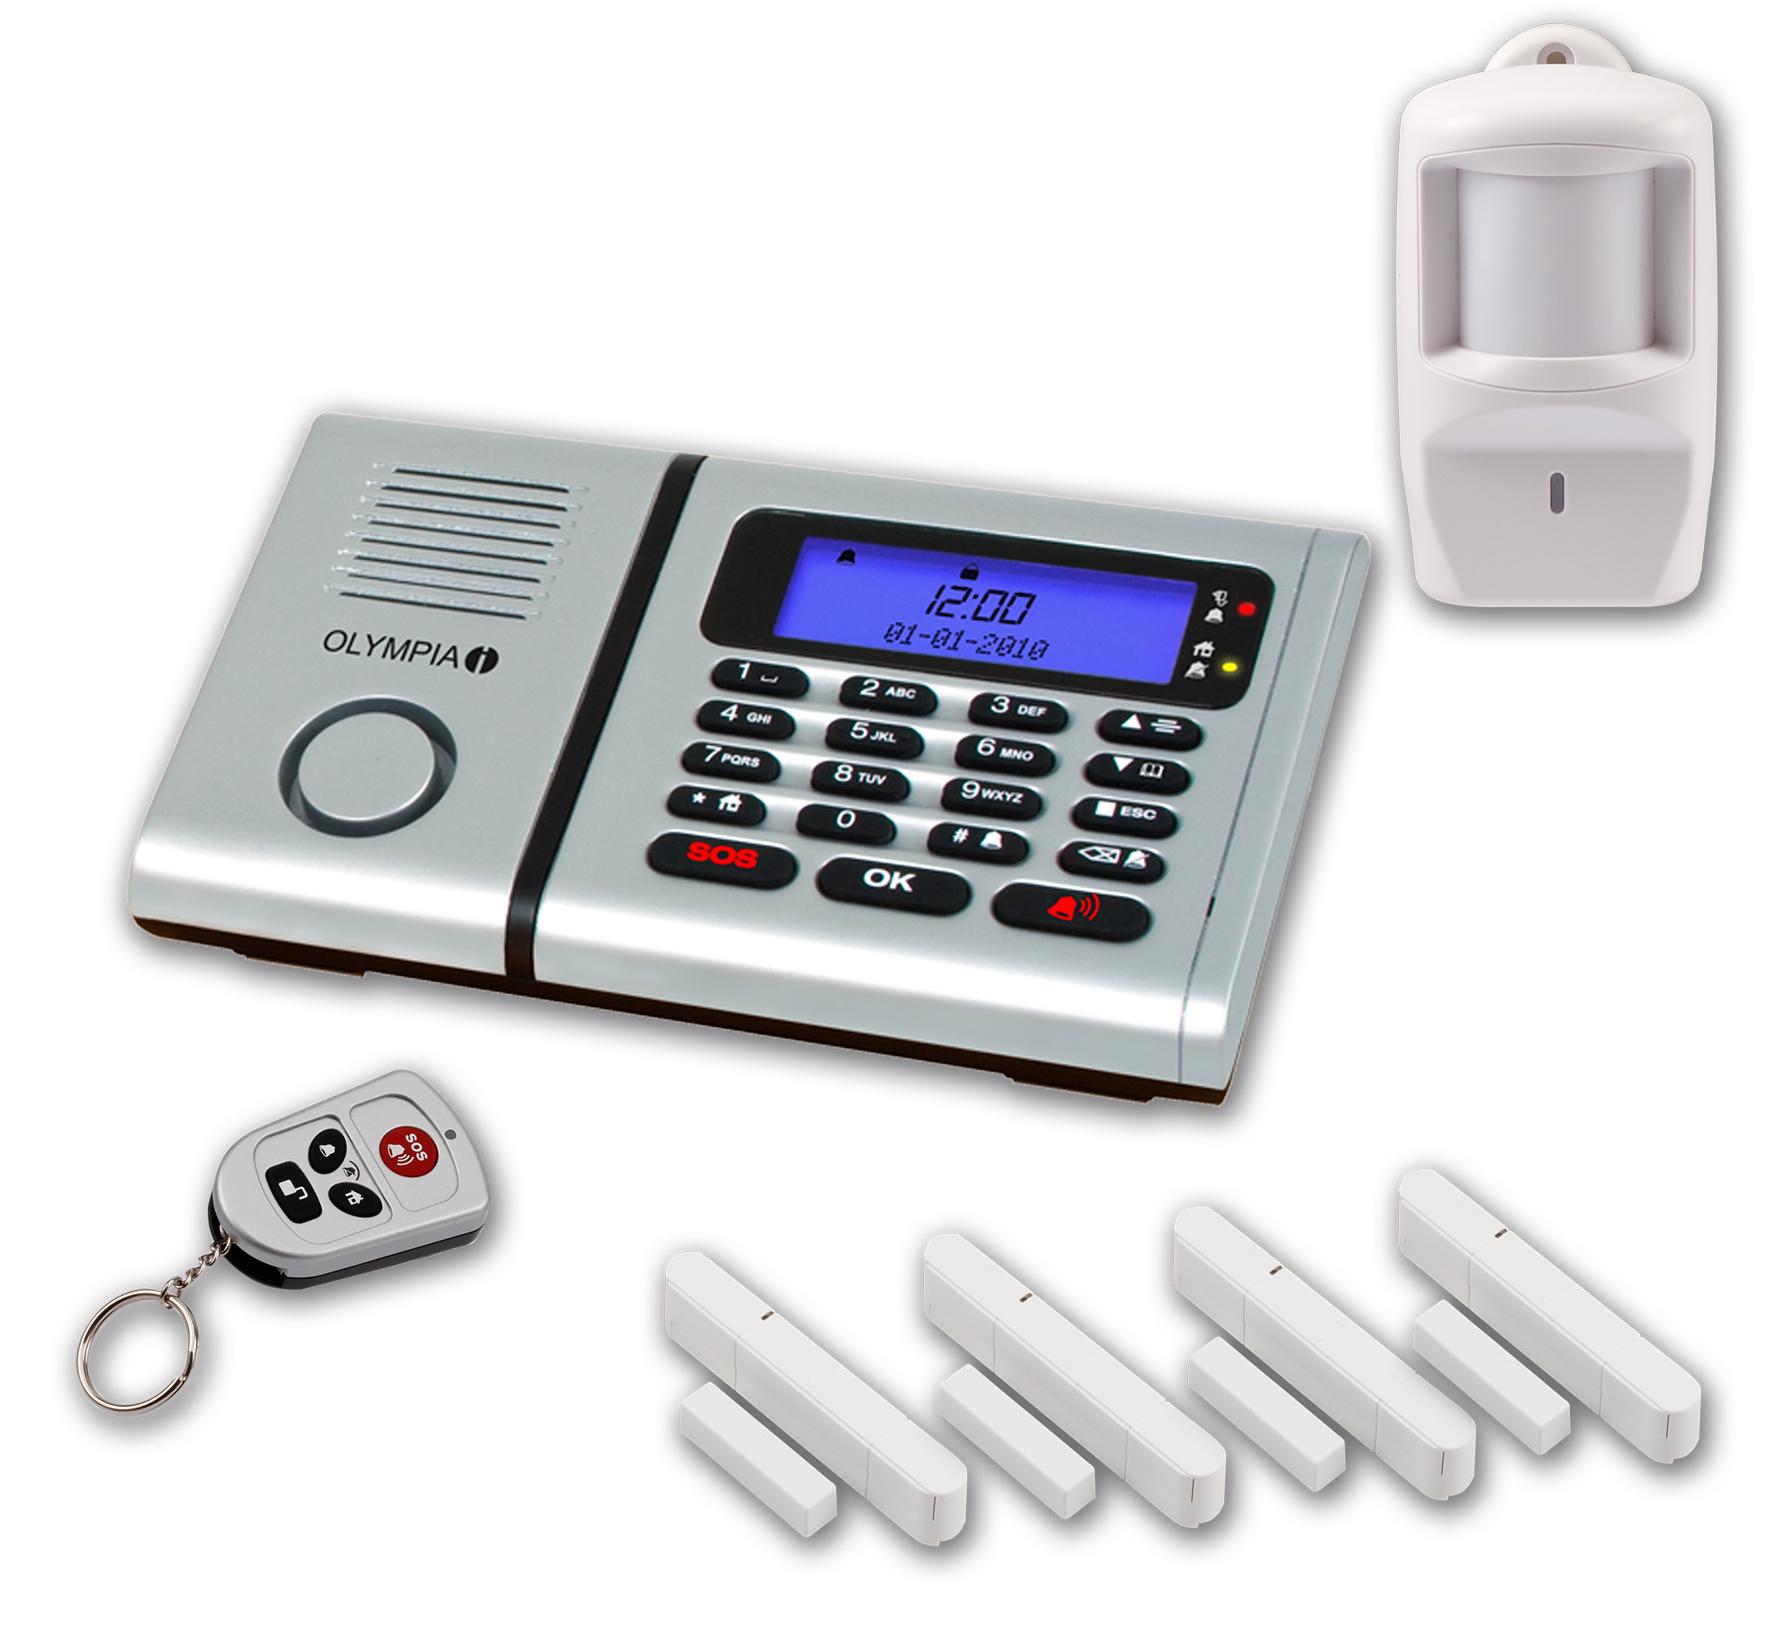 OlympiaProtect9571 Drahtlose Haus Funk Alarmanlage Notruf Freisprechfunktion GSM